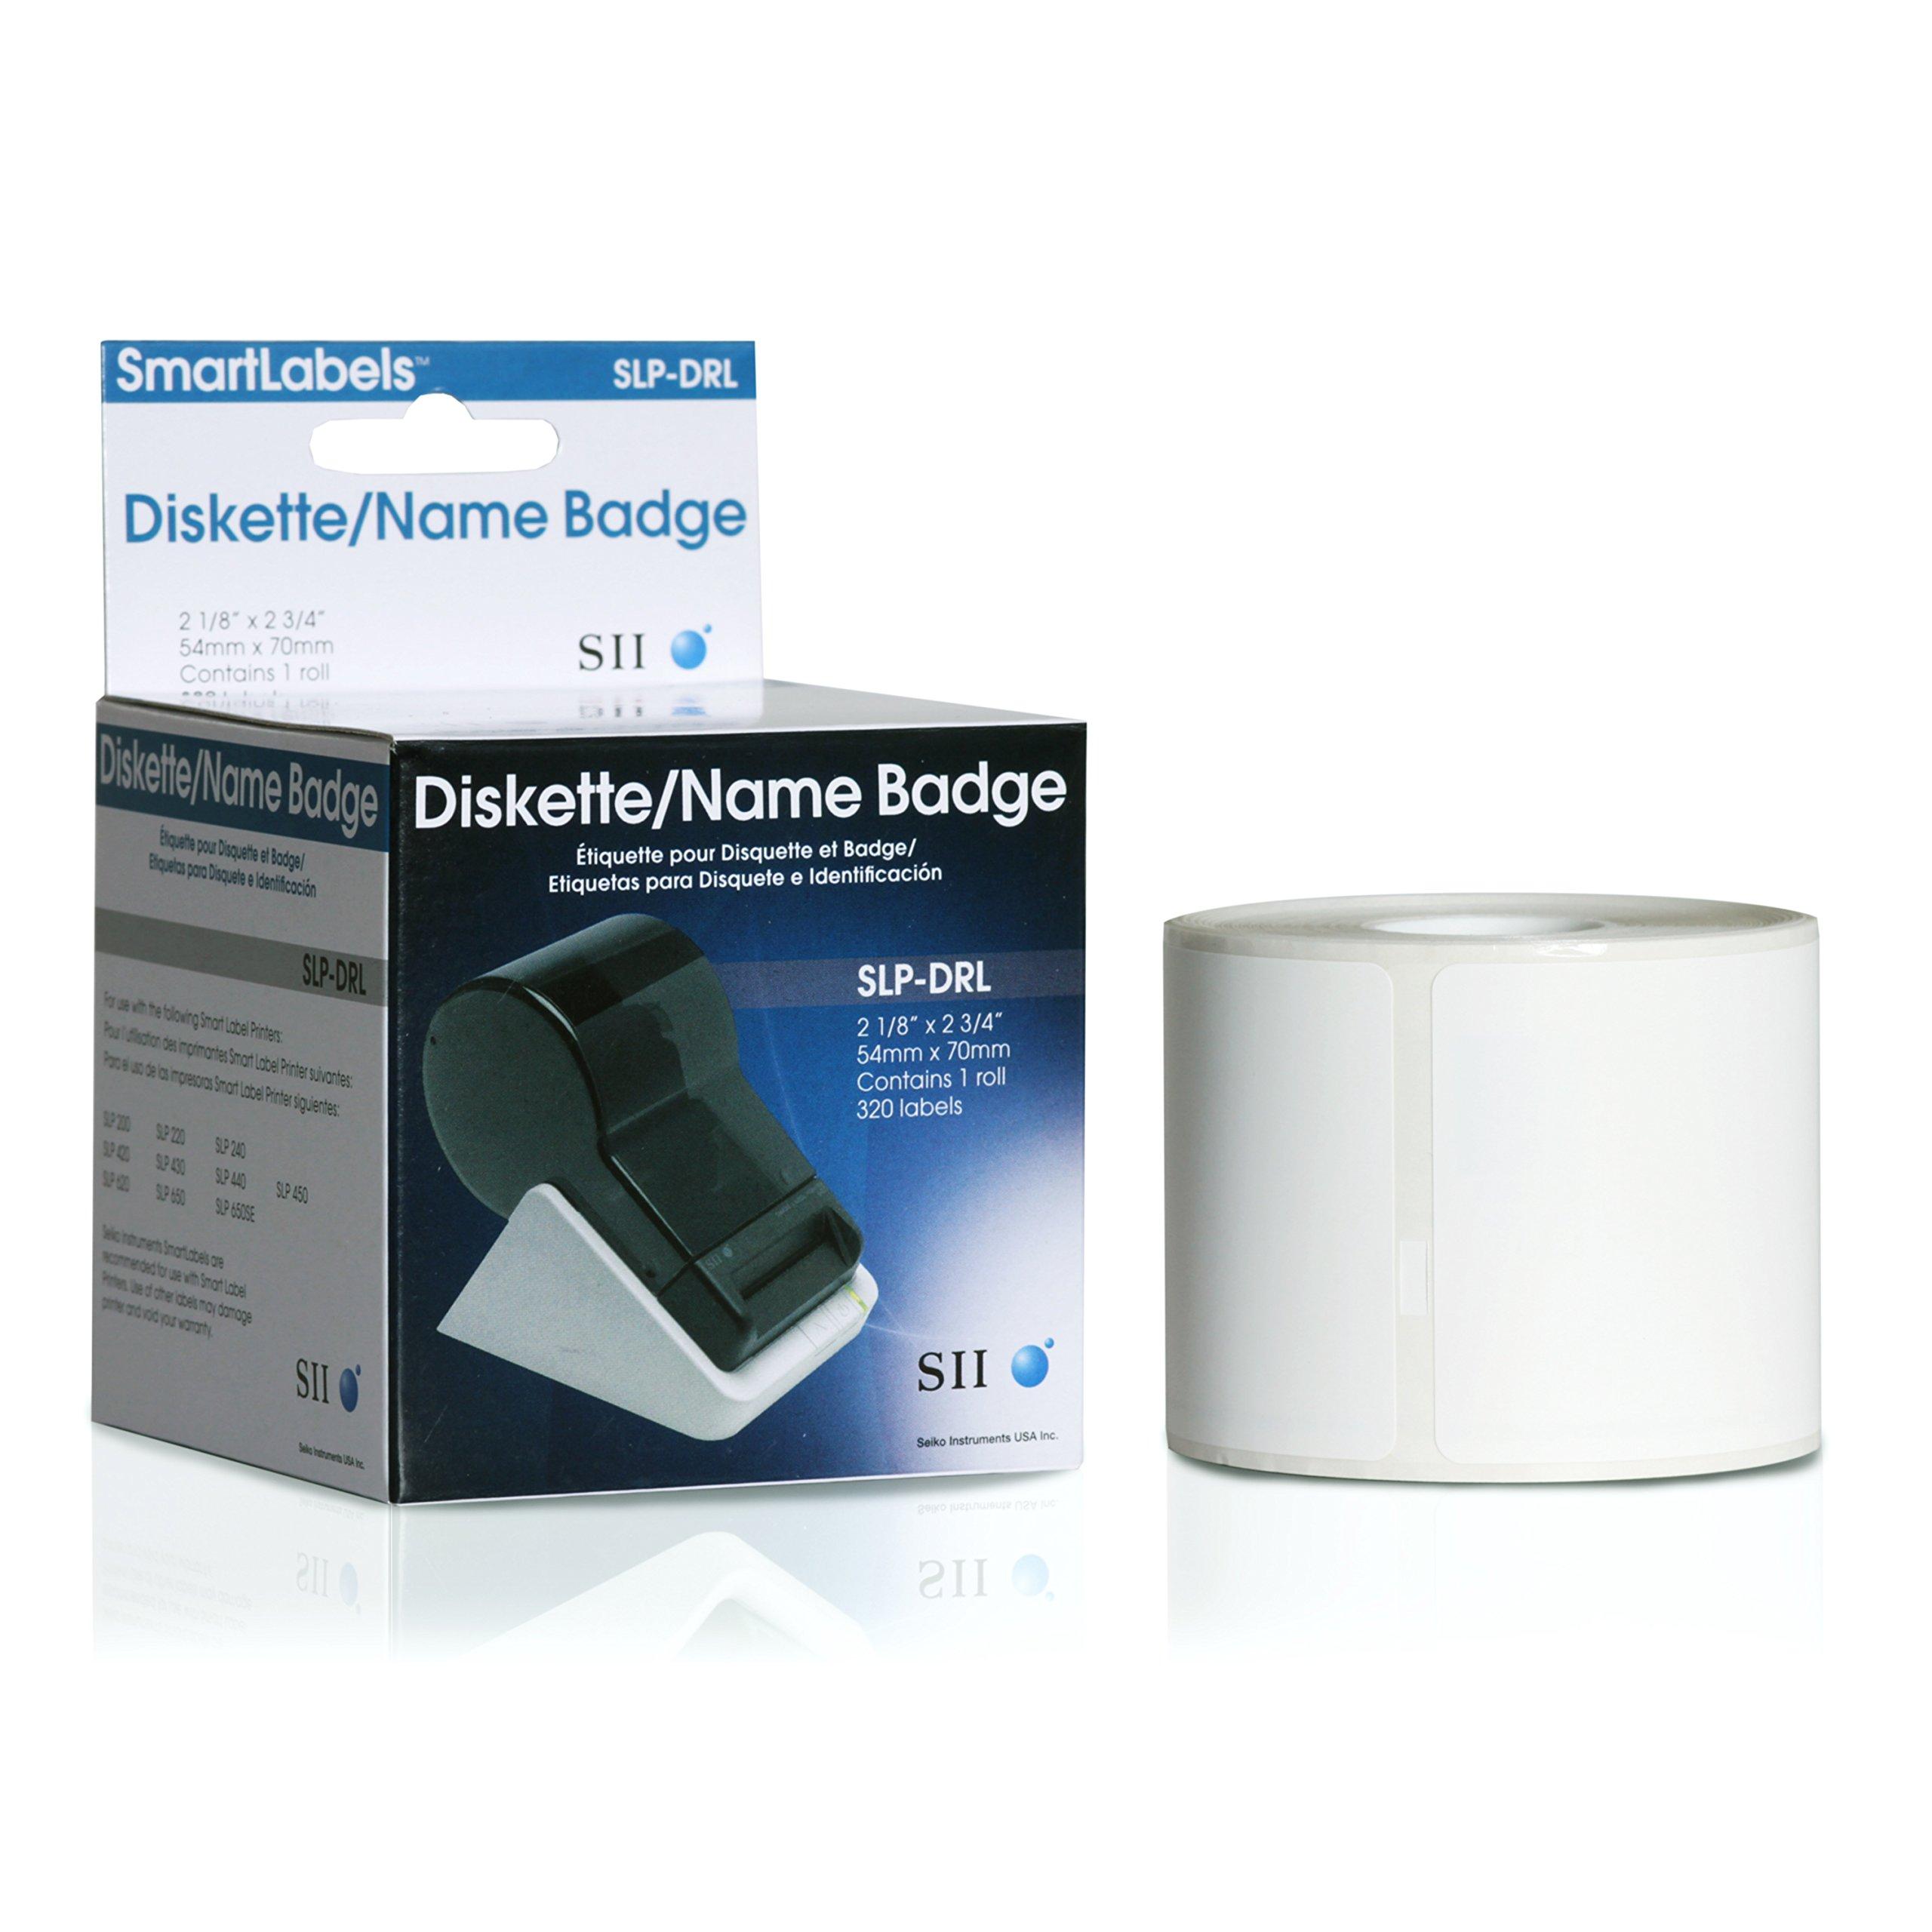 Seiko Instruments Diskette Labels for Smart Label Printers (SLP-DRL)